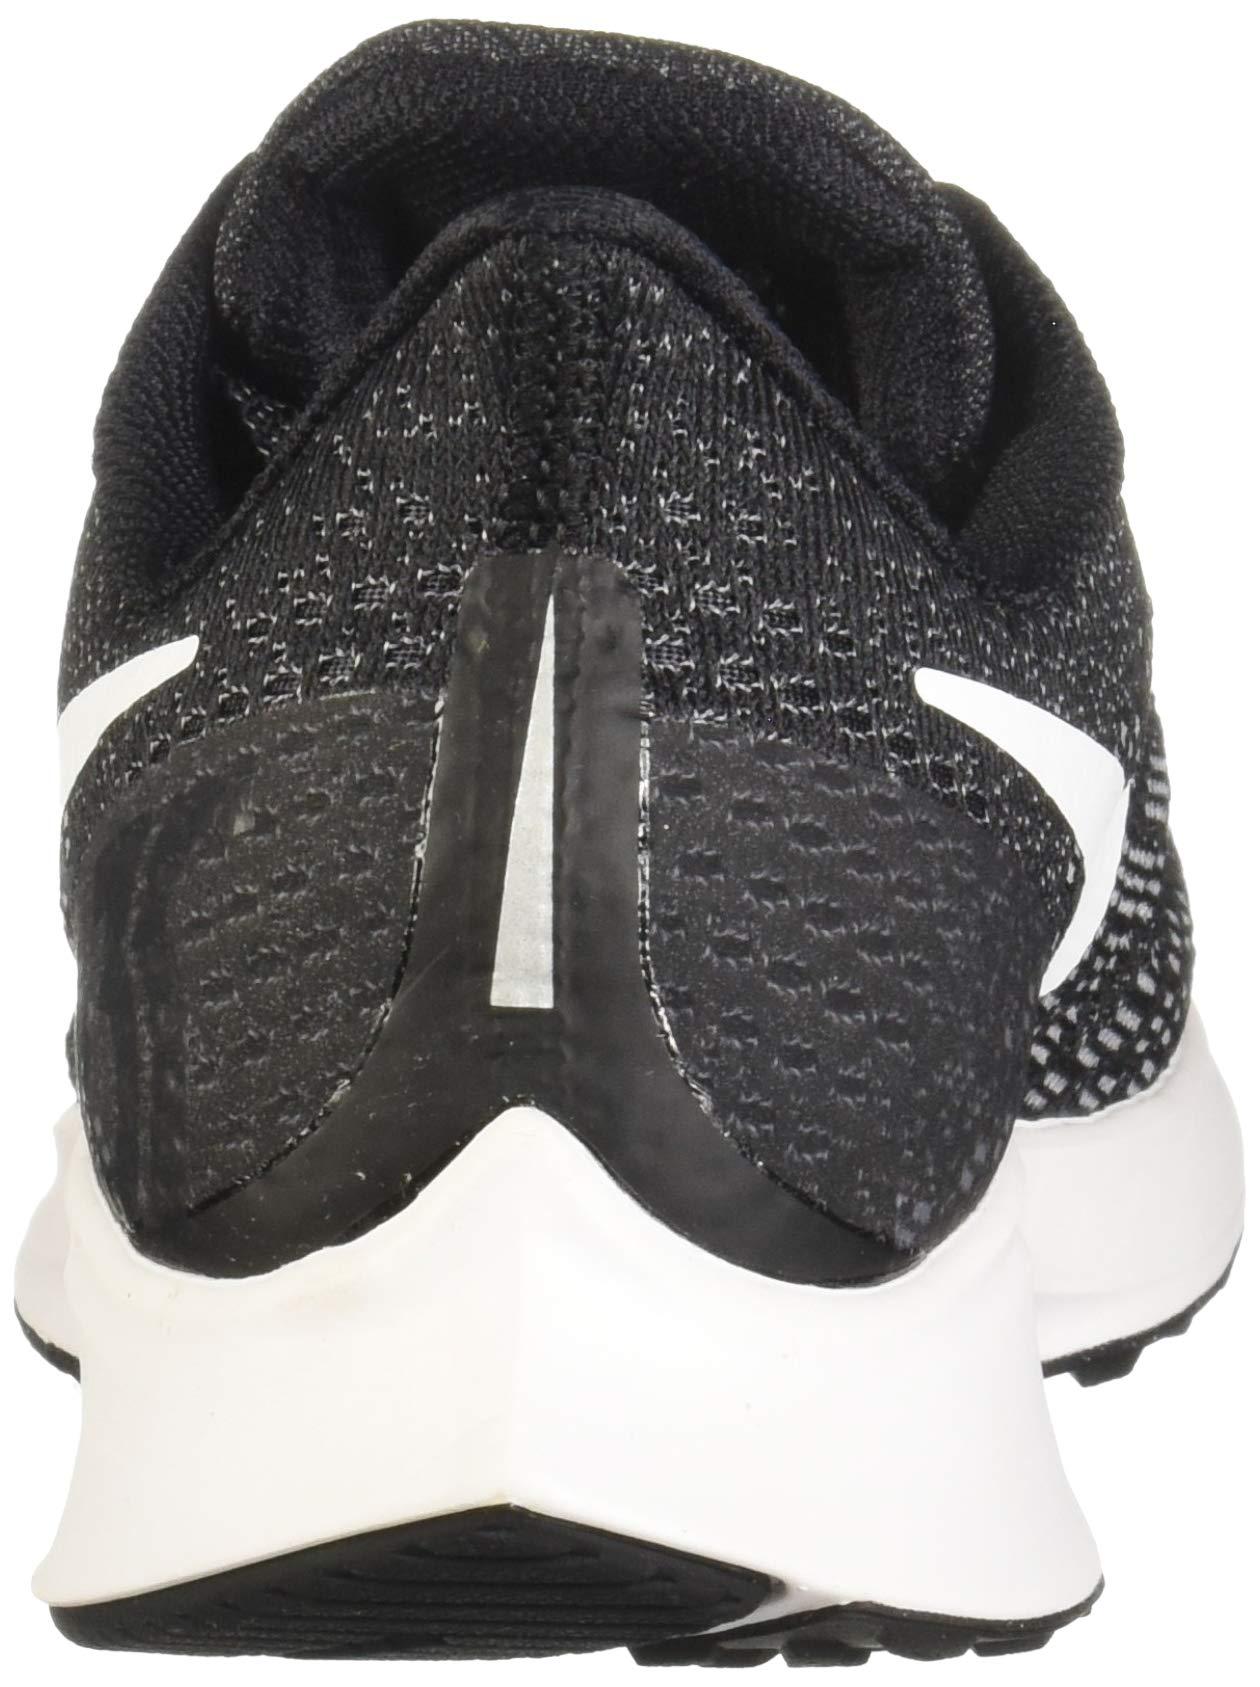 Nike Shox Current Gs Women's Running Shoe (5, Black/Black) by Nike (Image #2)